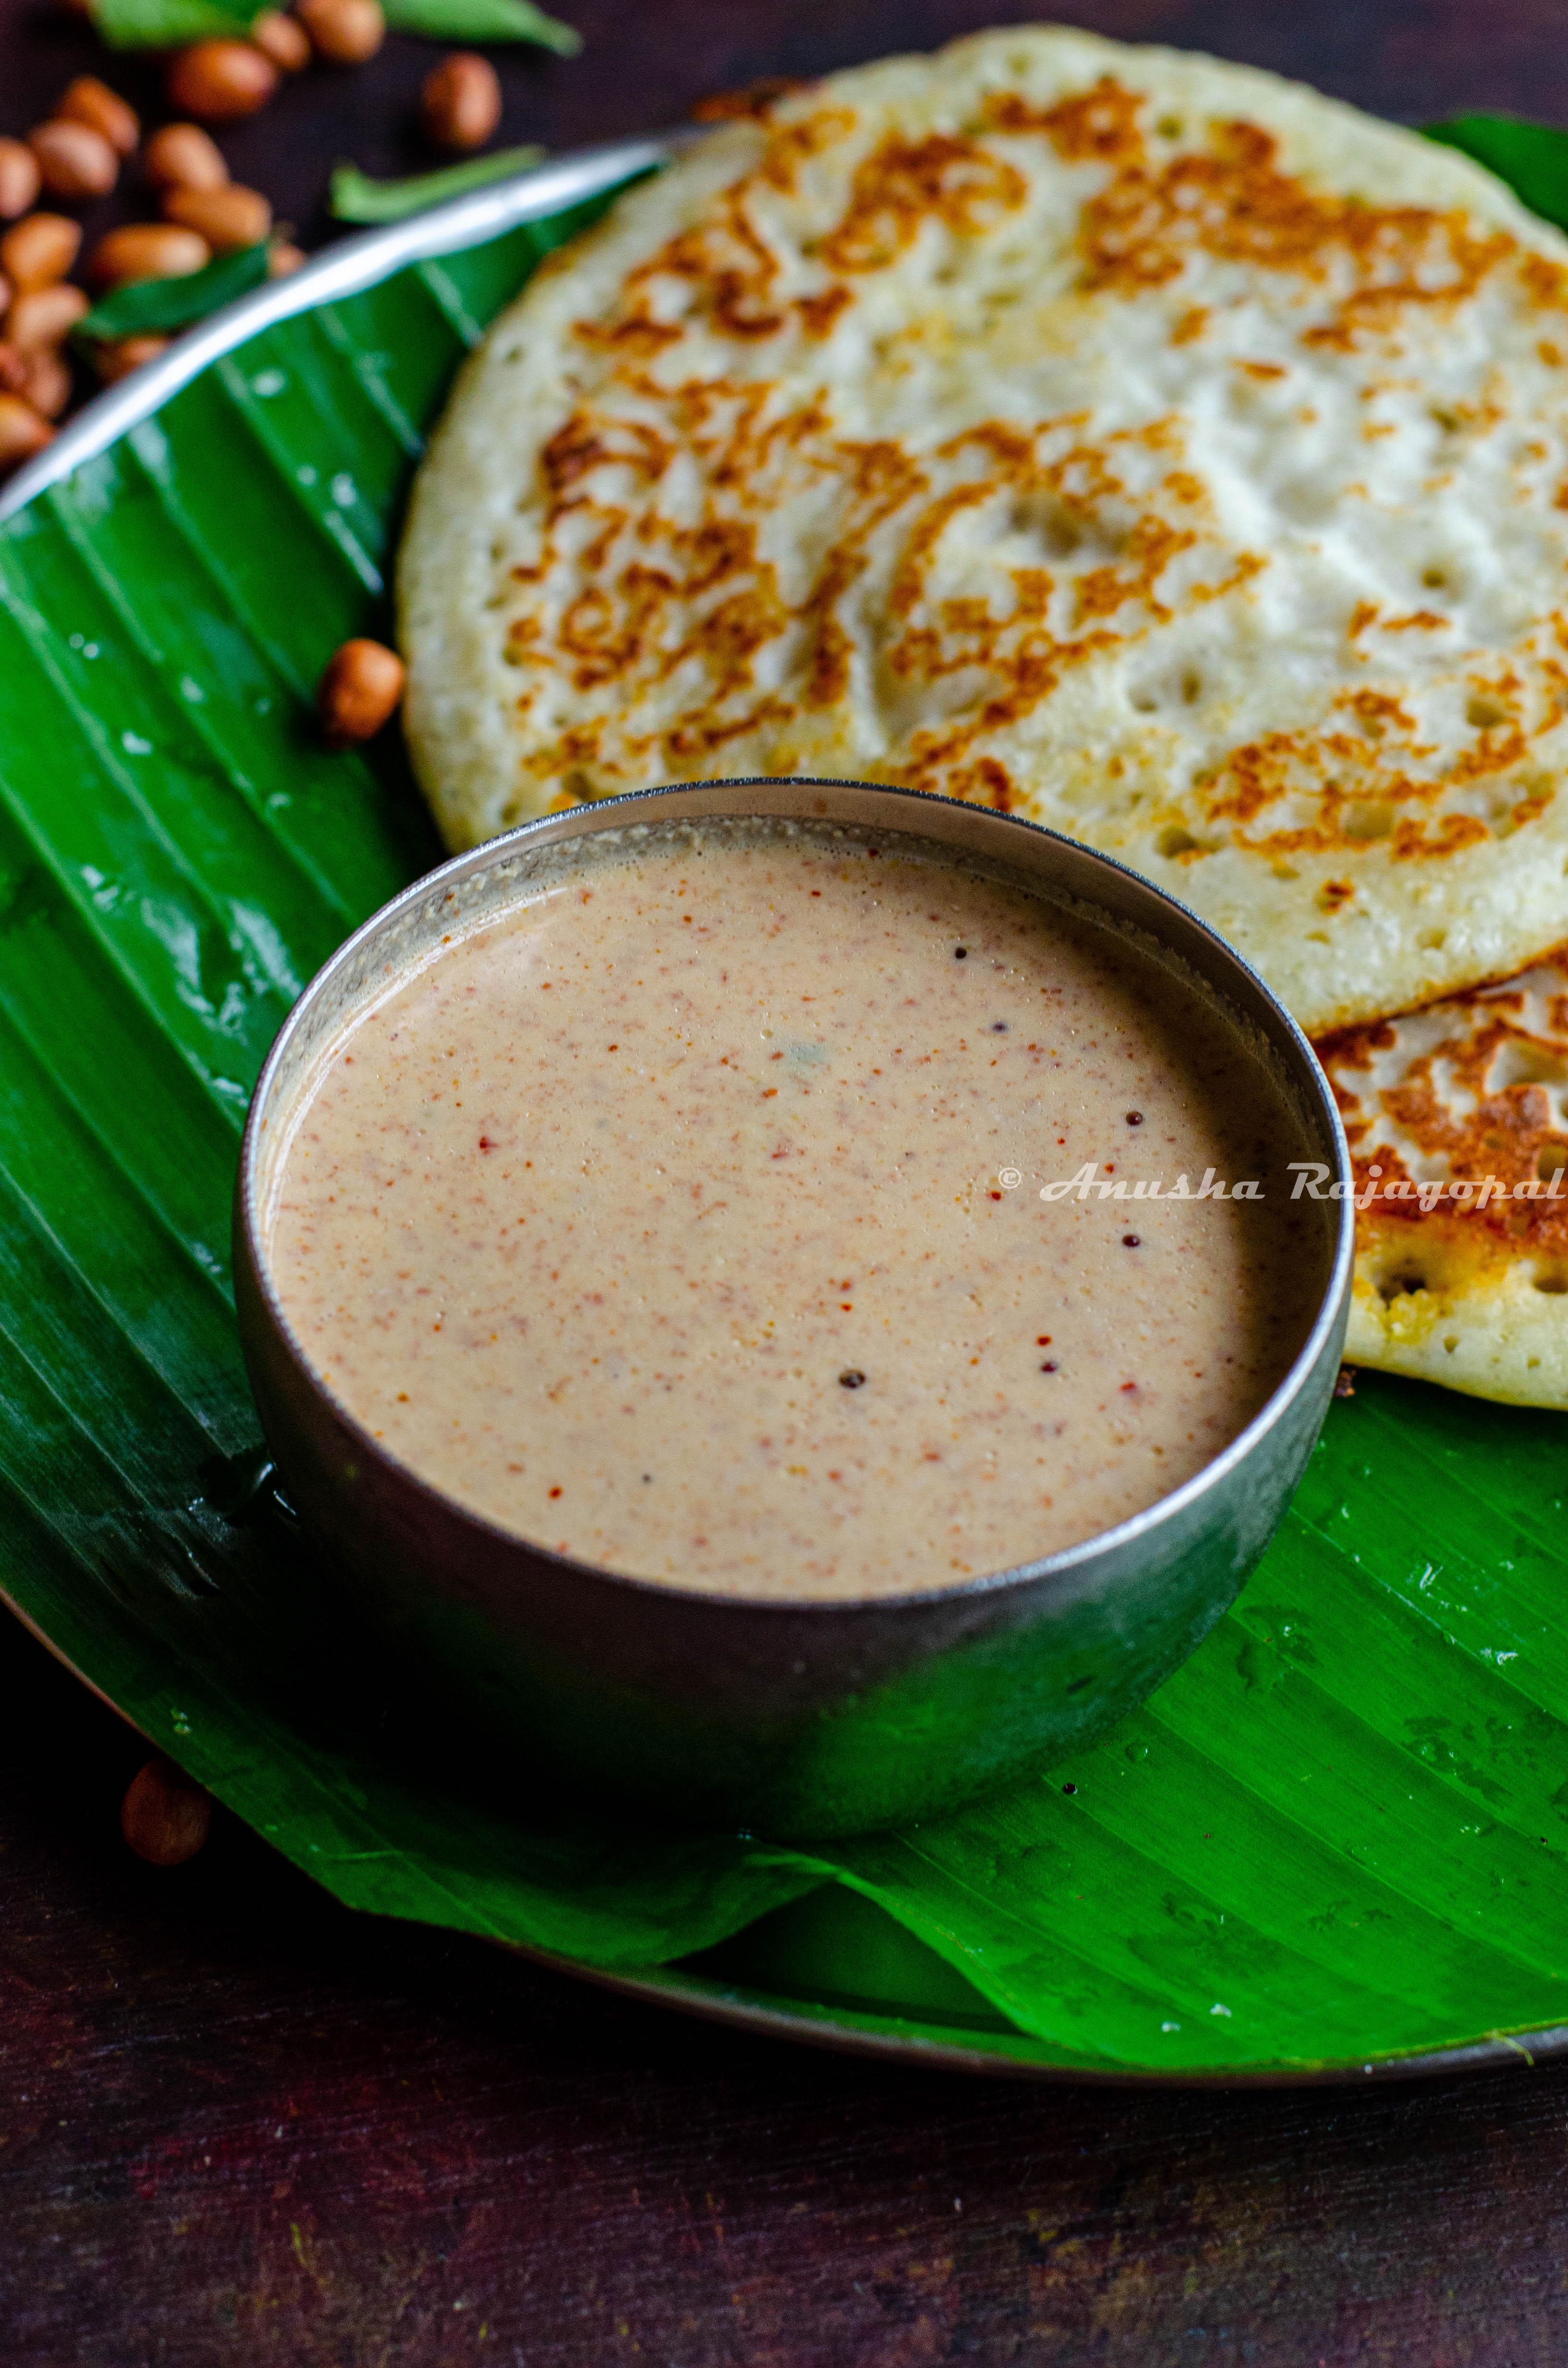 Palli chutney for dosa- vegan peanut chutney served with dosas on a banana leaf